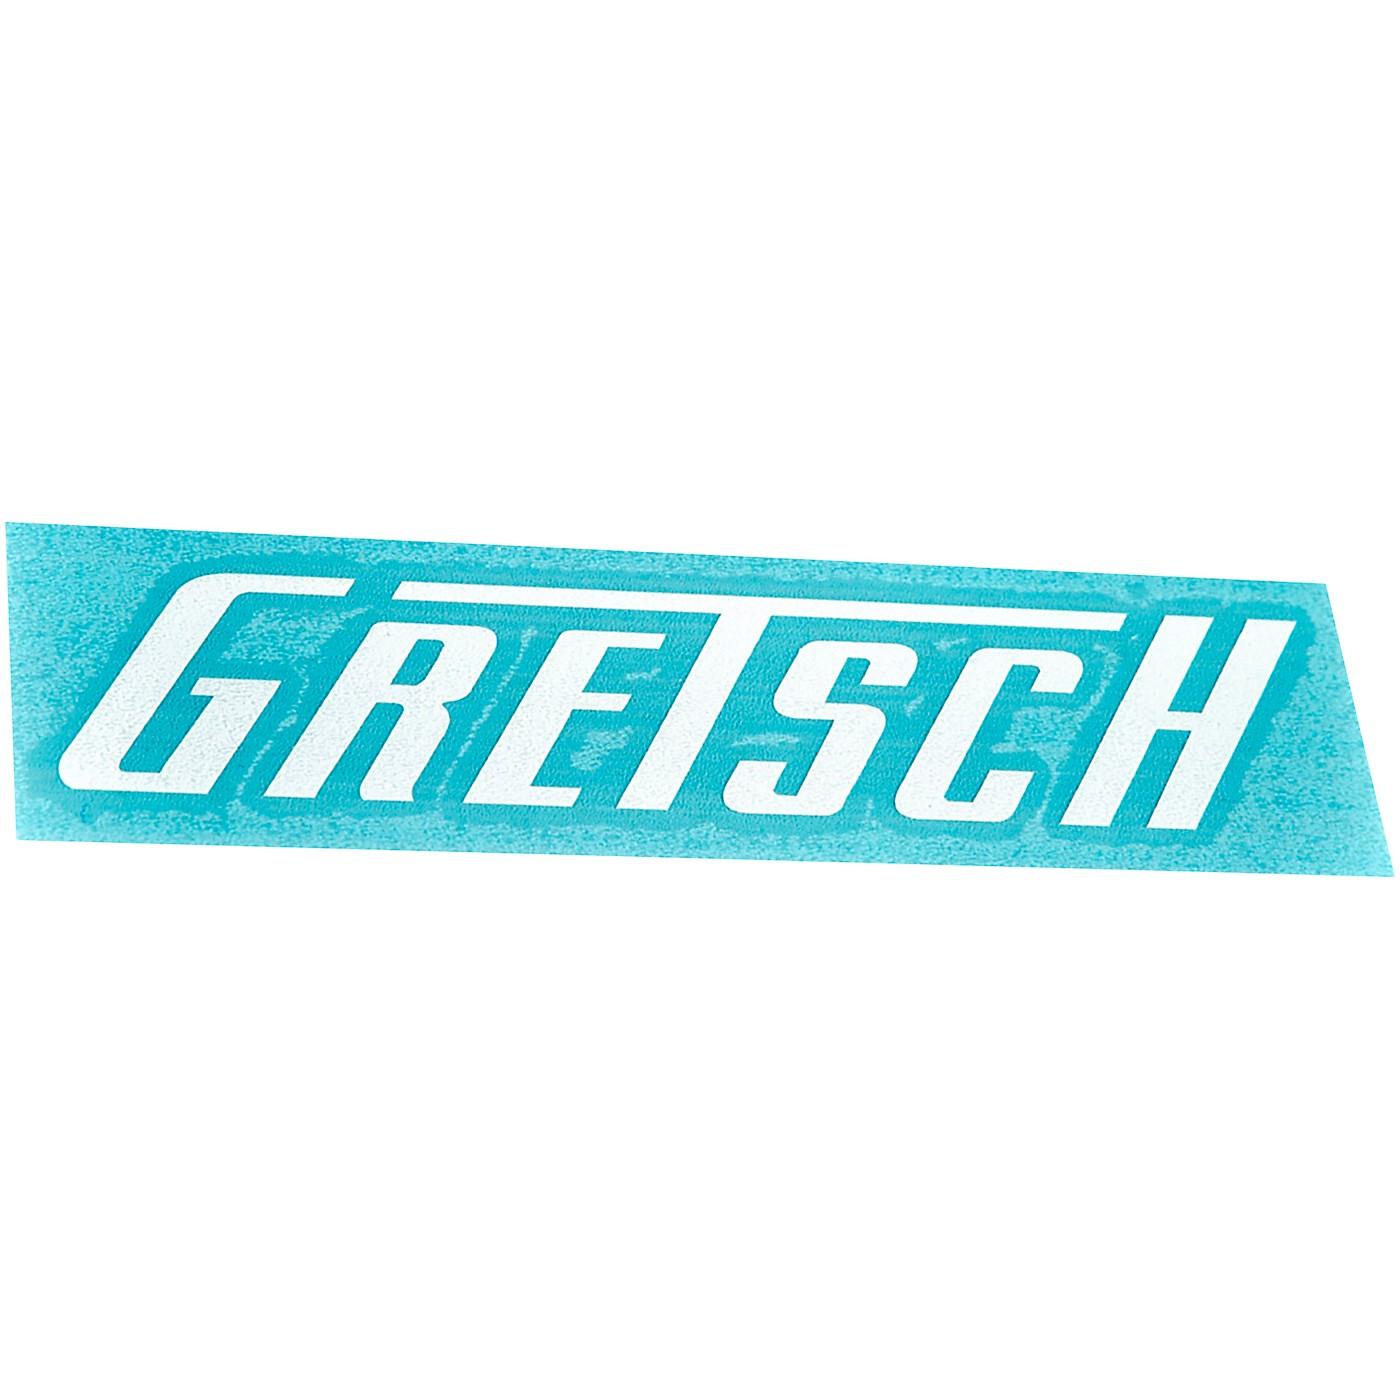 Gretsch Die Cut Window Sticker thumbnail